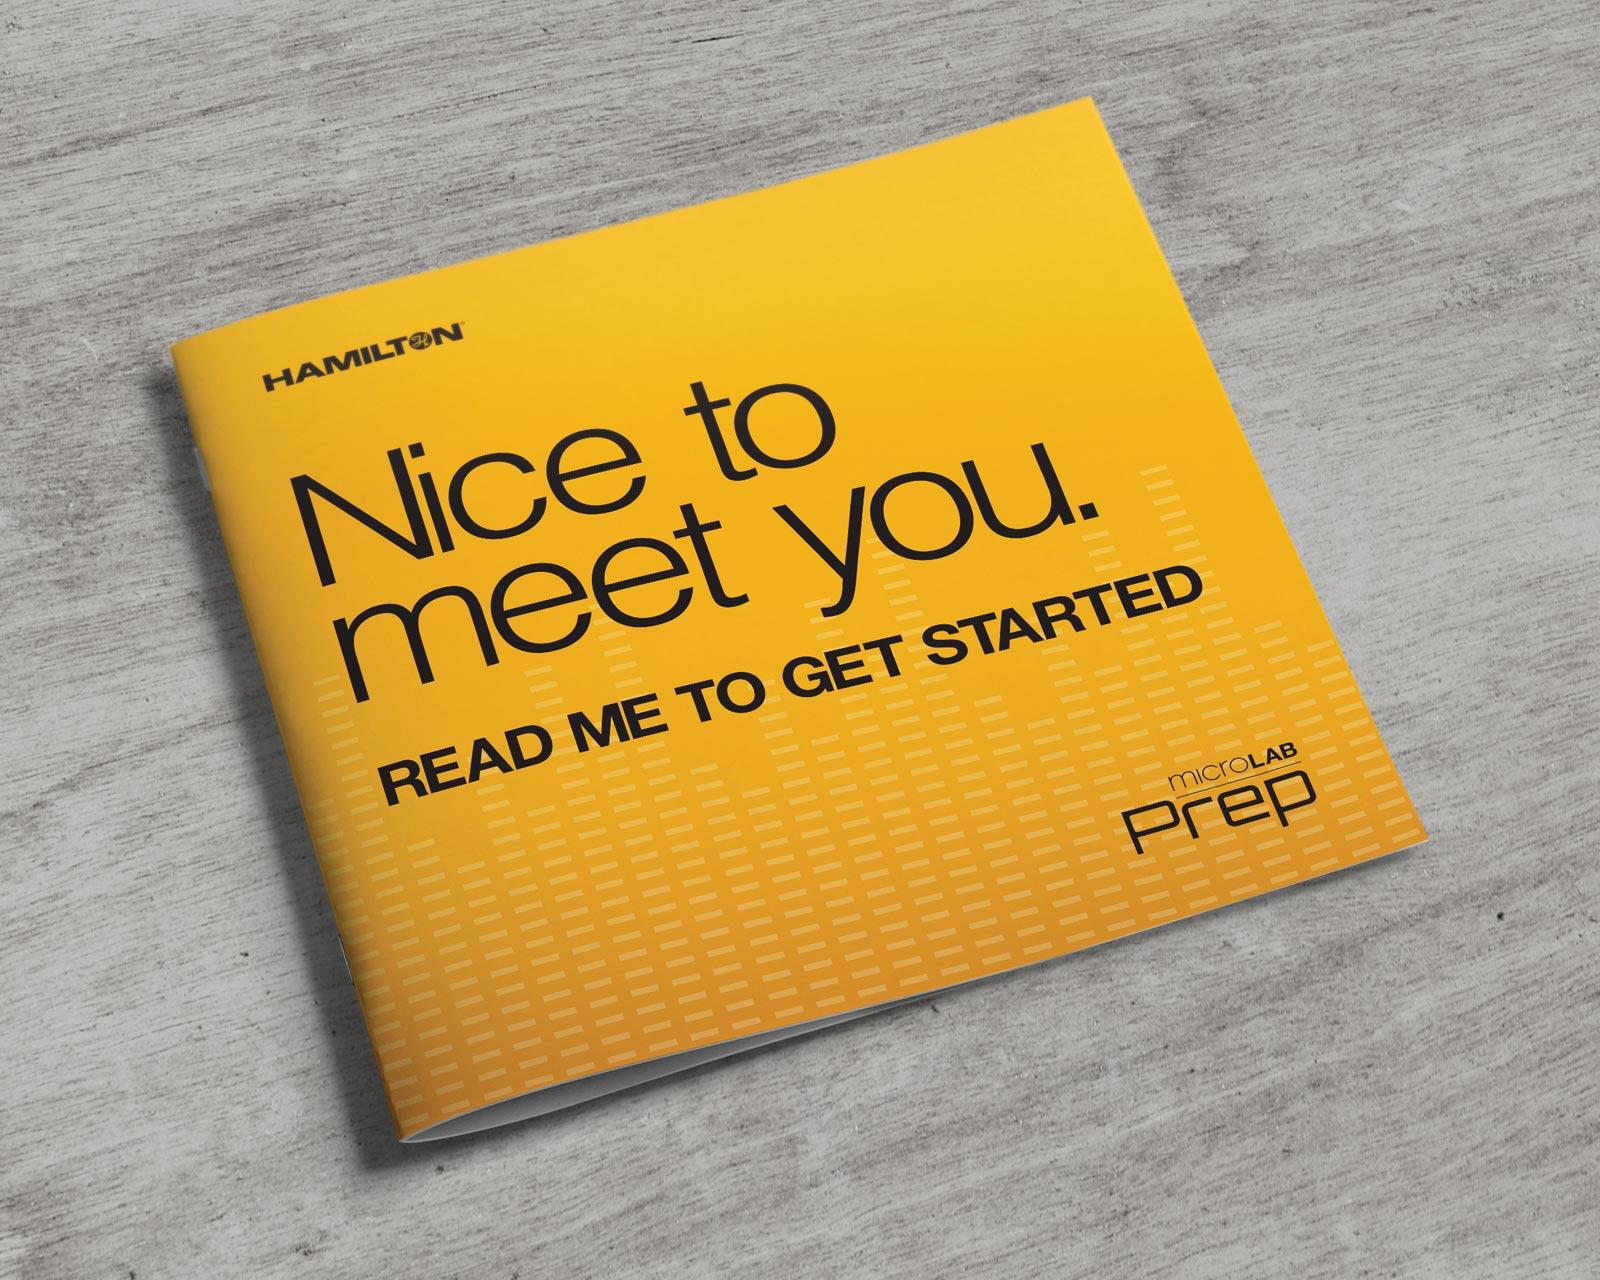 Microlab Prep Brand Launch